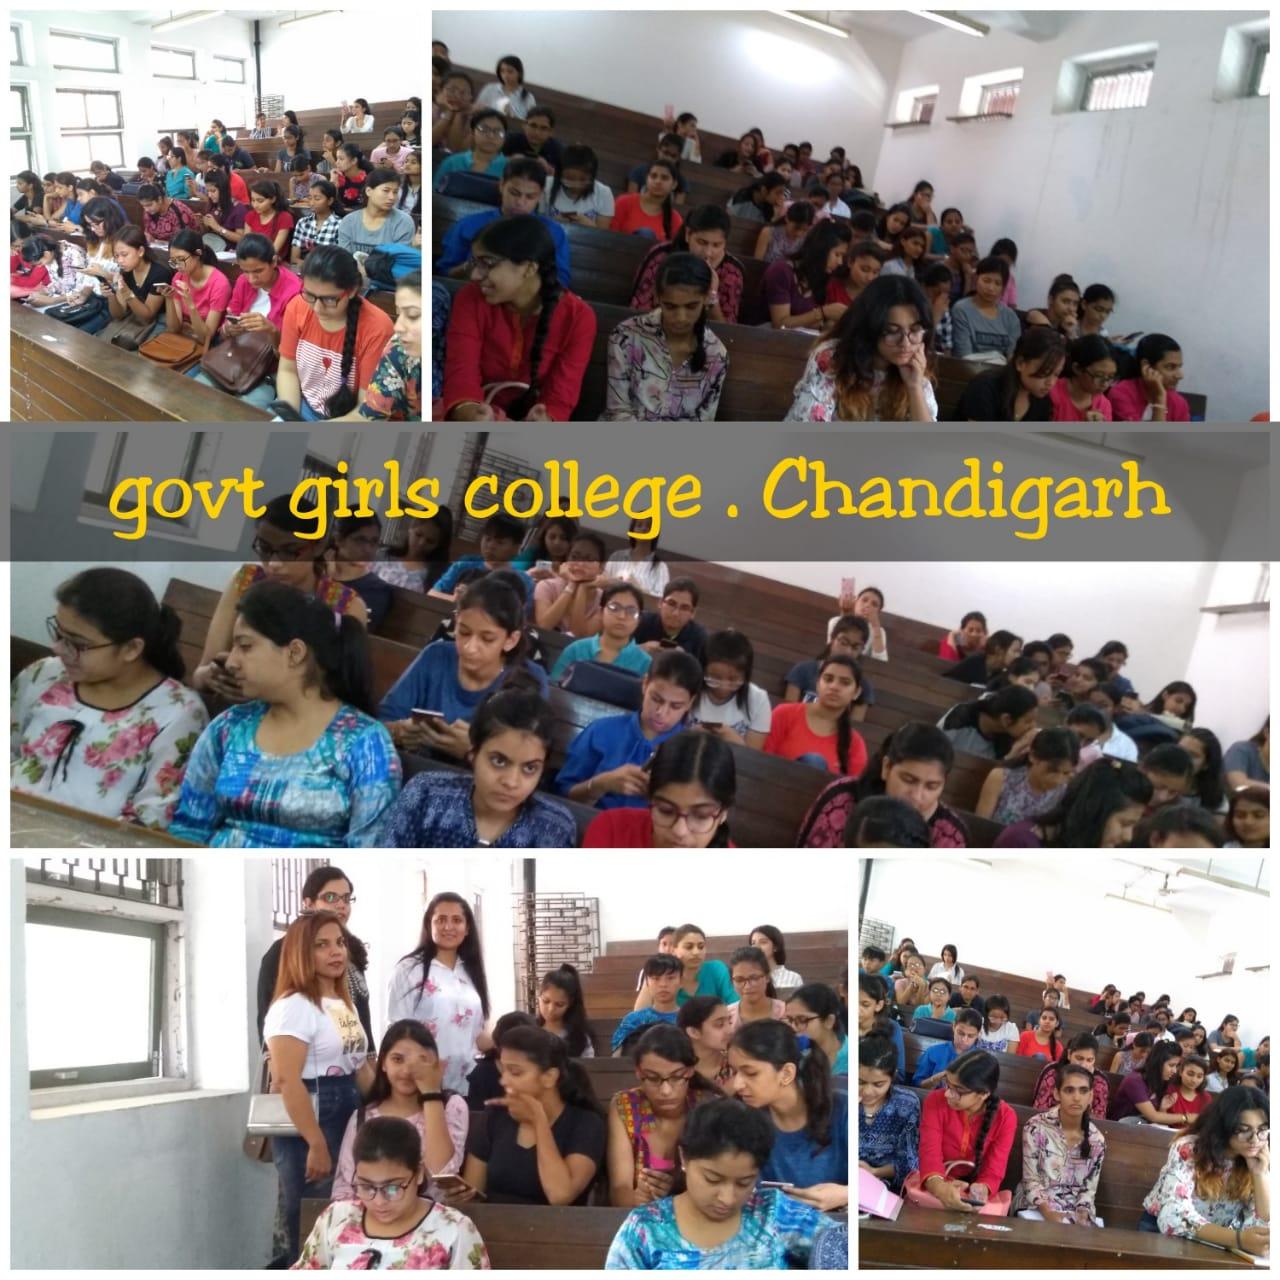 Govt Girls College Chandigarh.jpeg